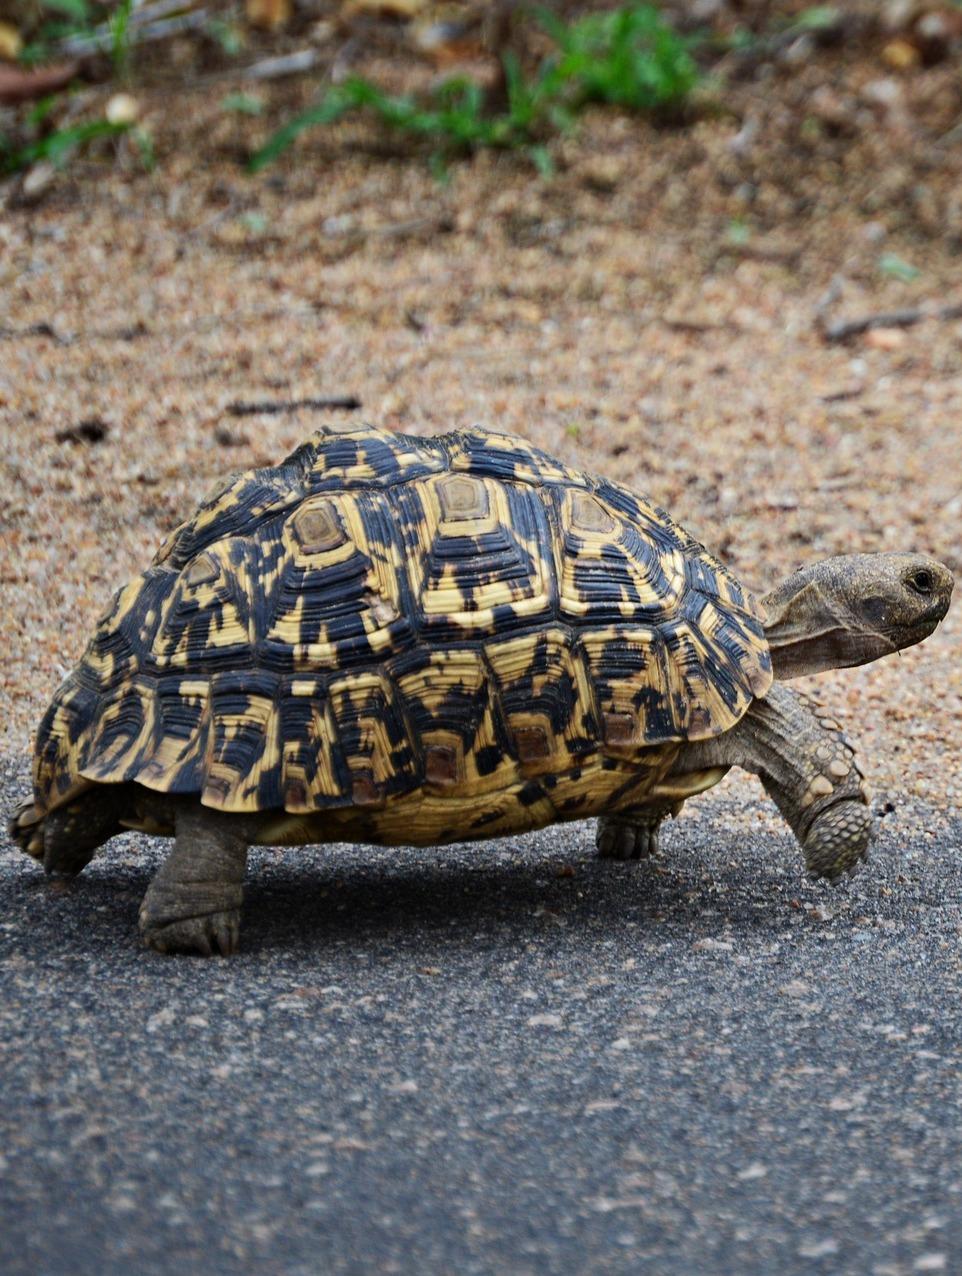 A leopard tortoise